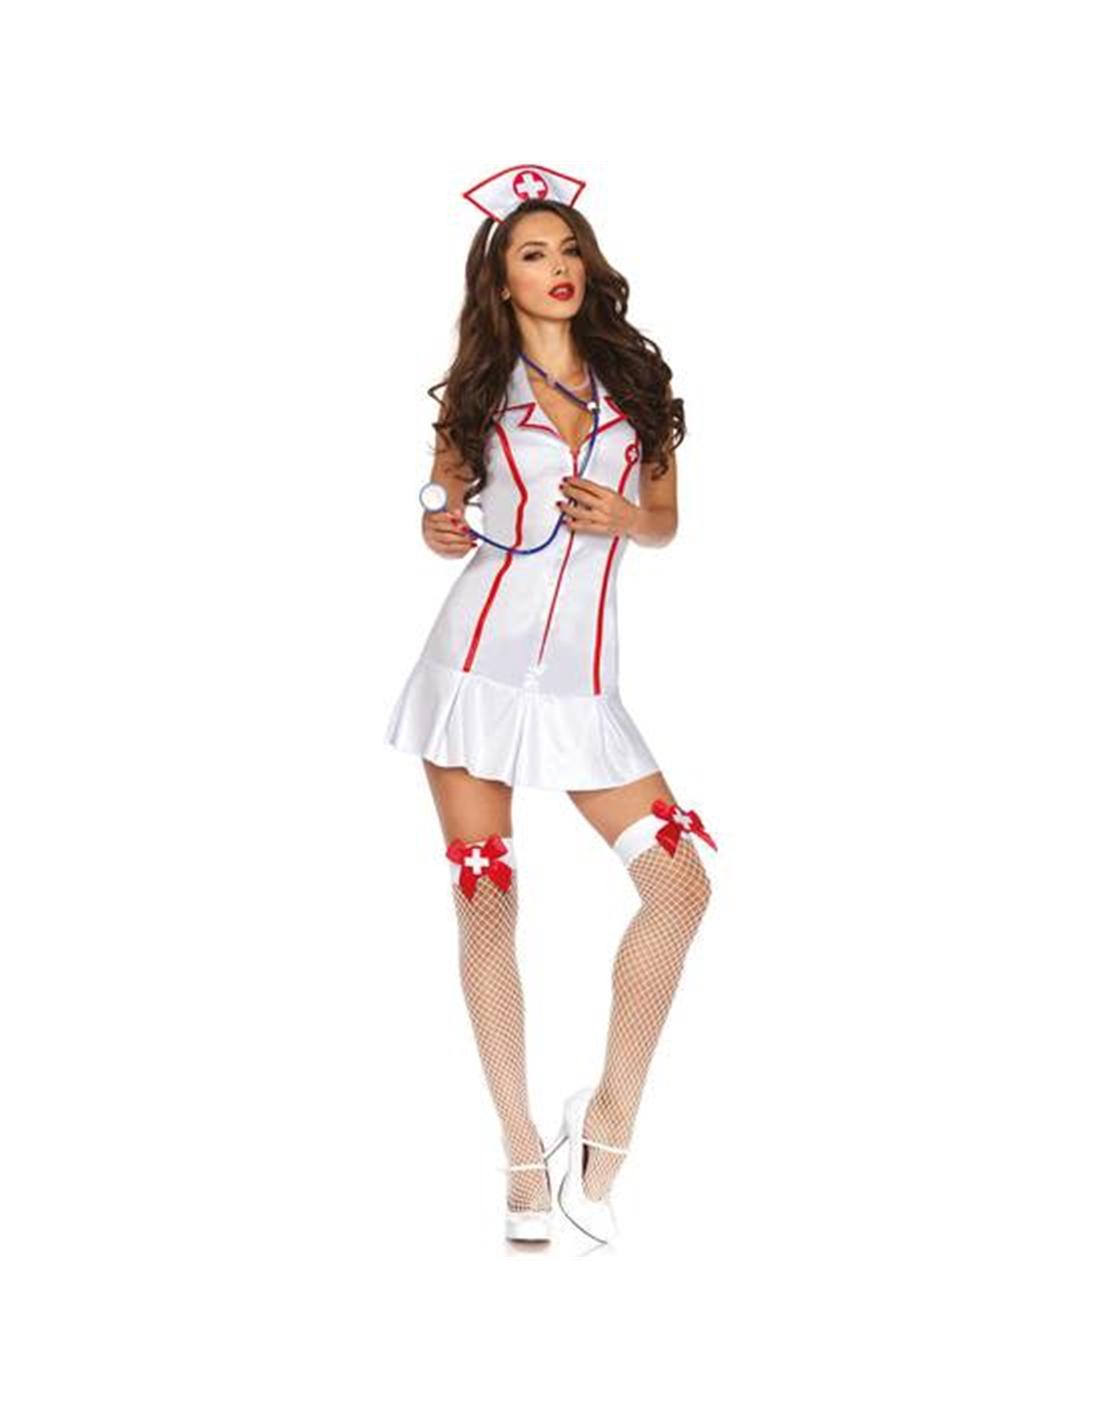 Fantasia De Enfermeira Head Nurse - 36-38 S/M - PR2010305154